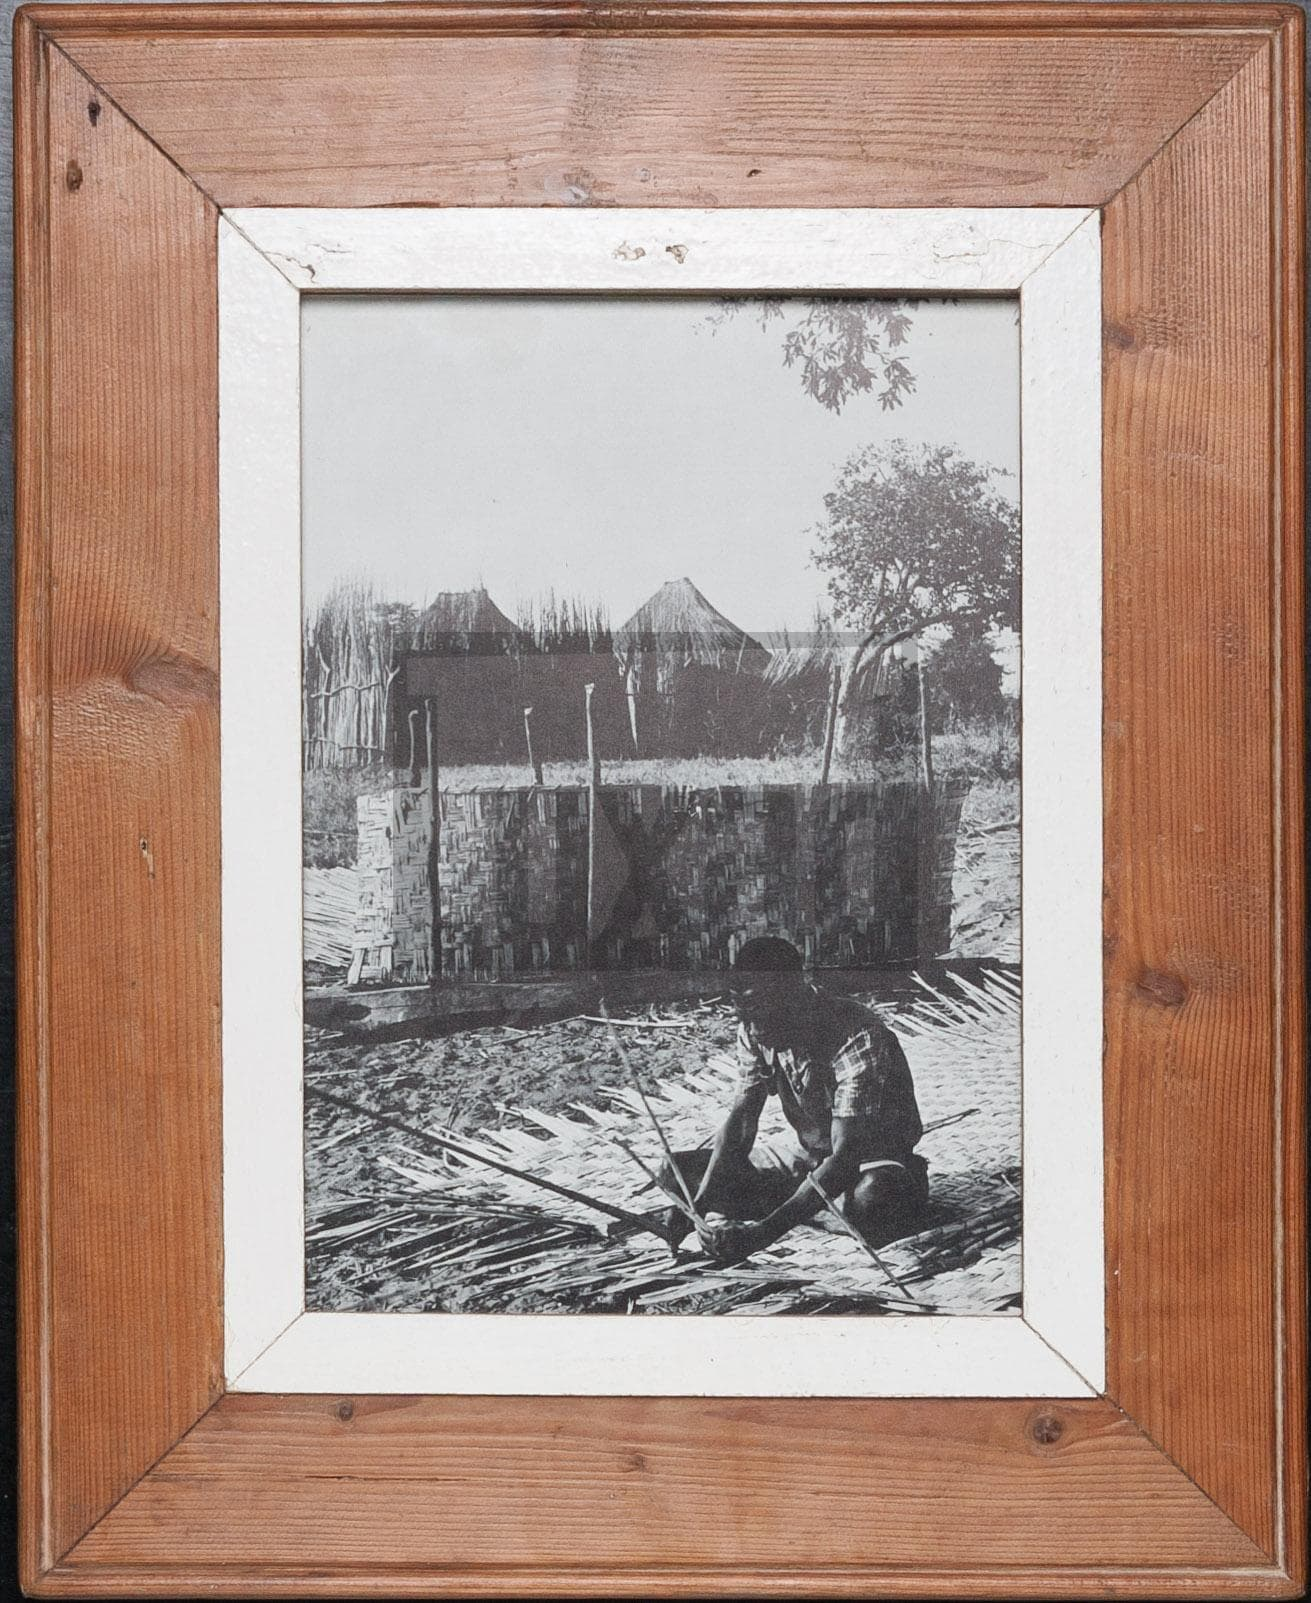 Vintage-Bilderrahmen aus altem Holz für Fotos DIN A4